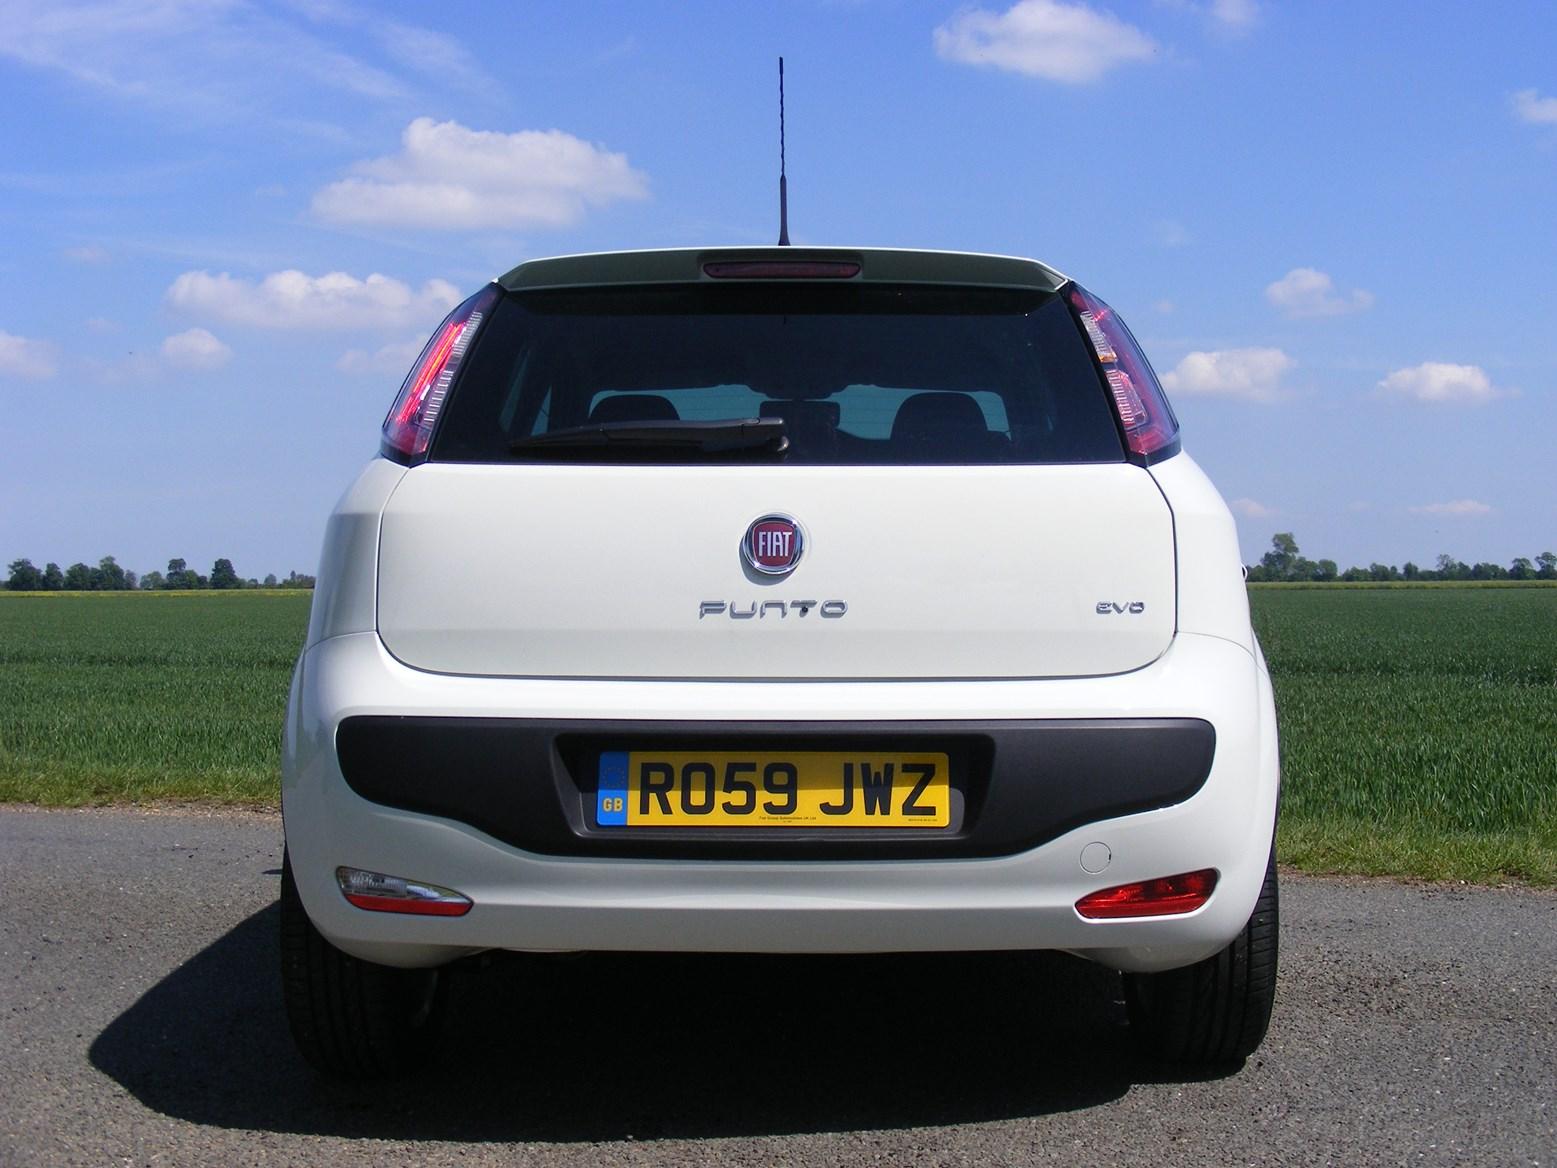 fiat punto evo hatchback review 2010 2012 parkers rh parkers co uk Fiat Cars fiat punto 2005 price guide